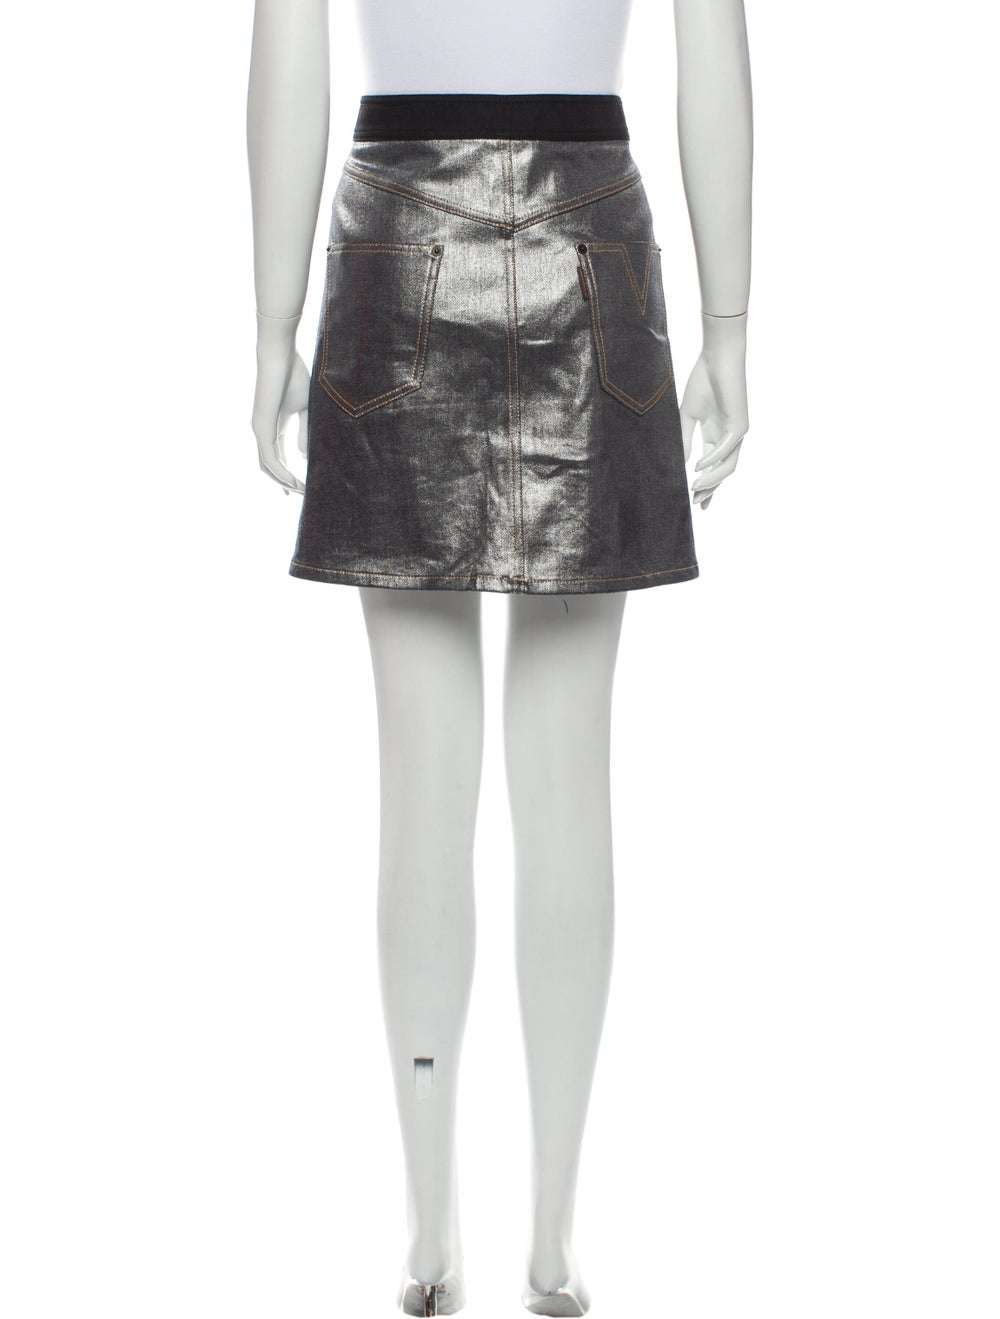 Louis Vuitton Mini Skirt Metallic - image 3